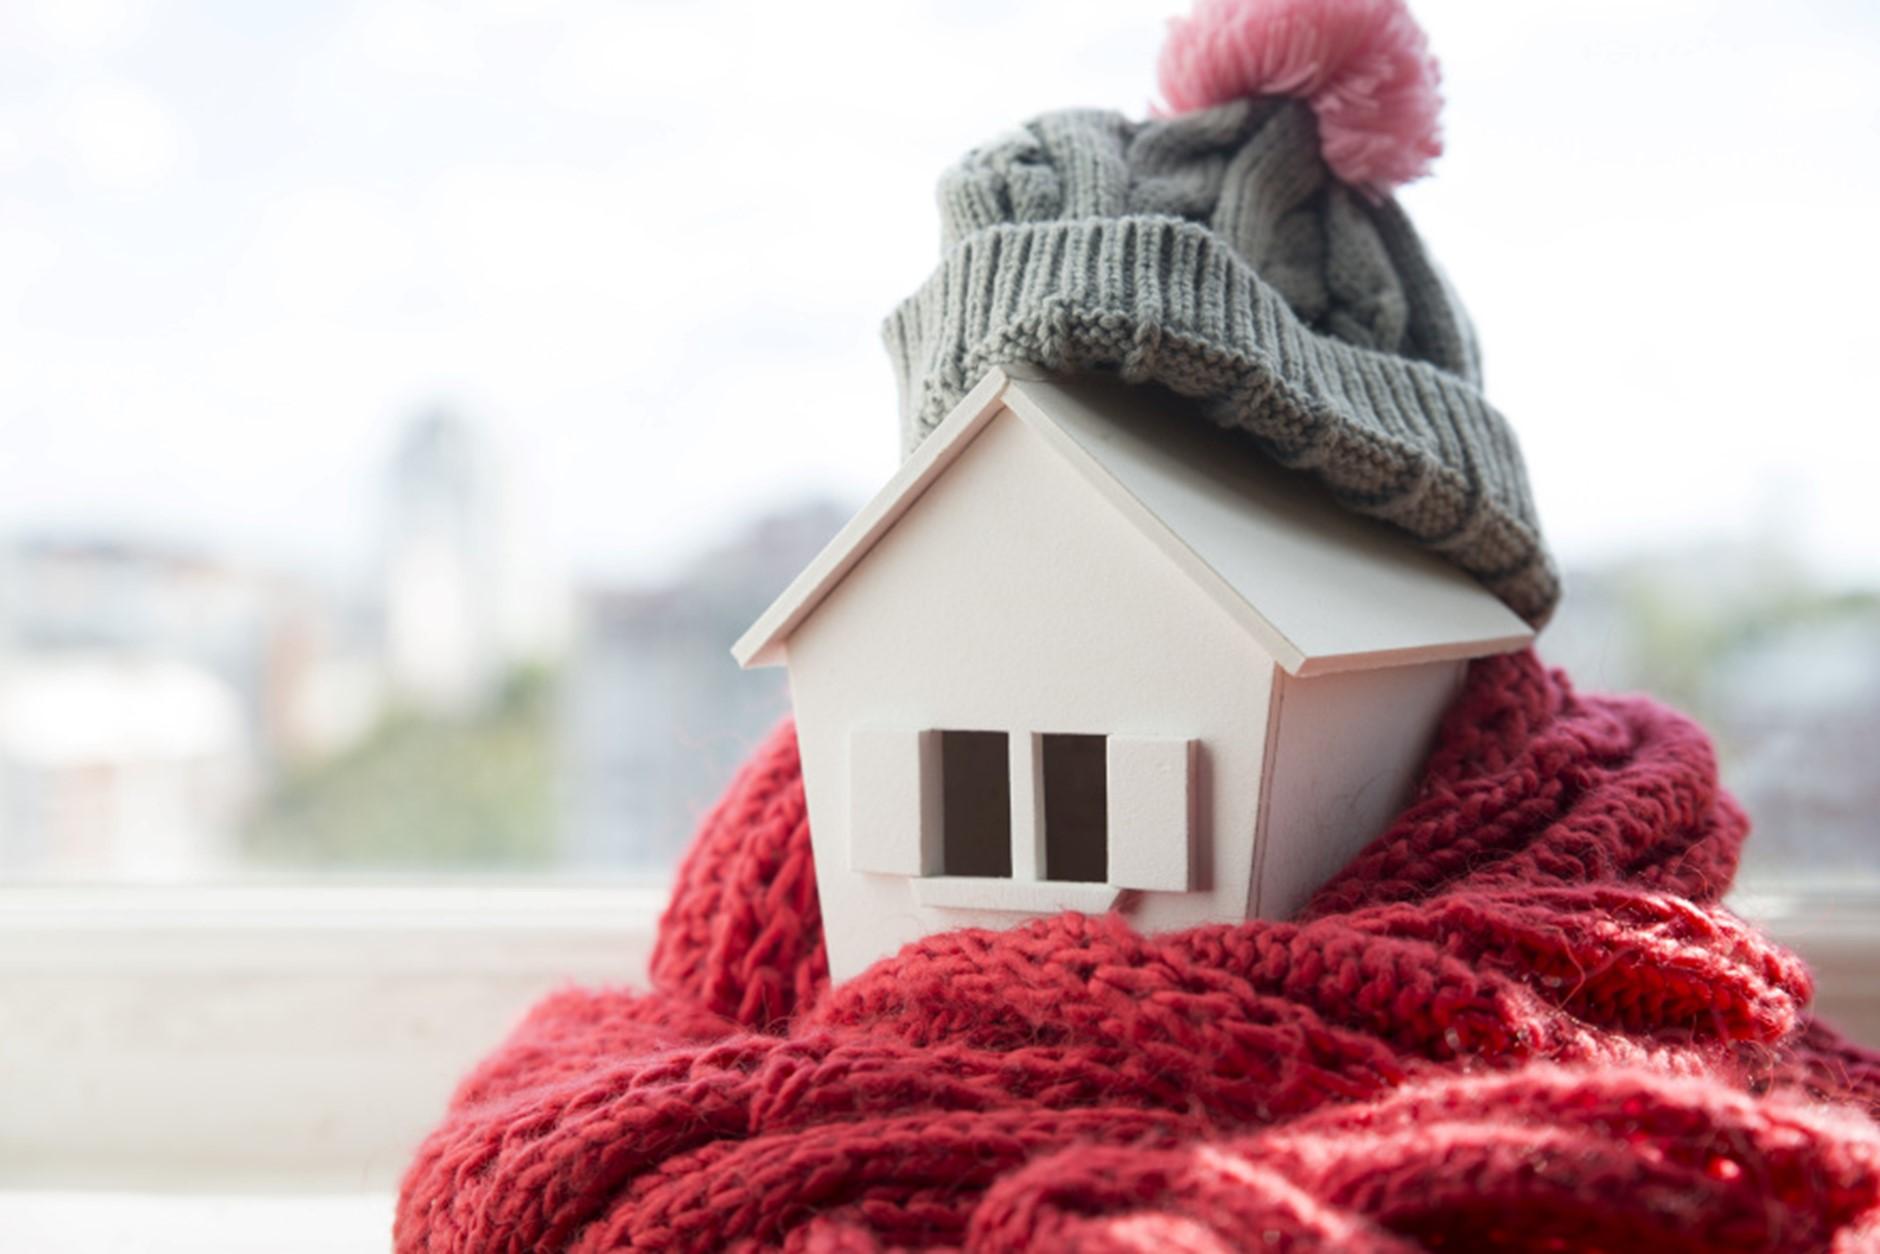 Healthy Homes Reminder Update